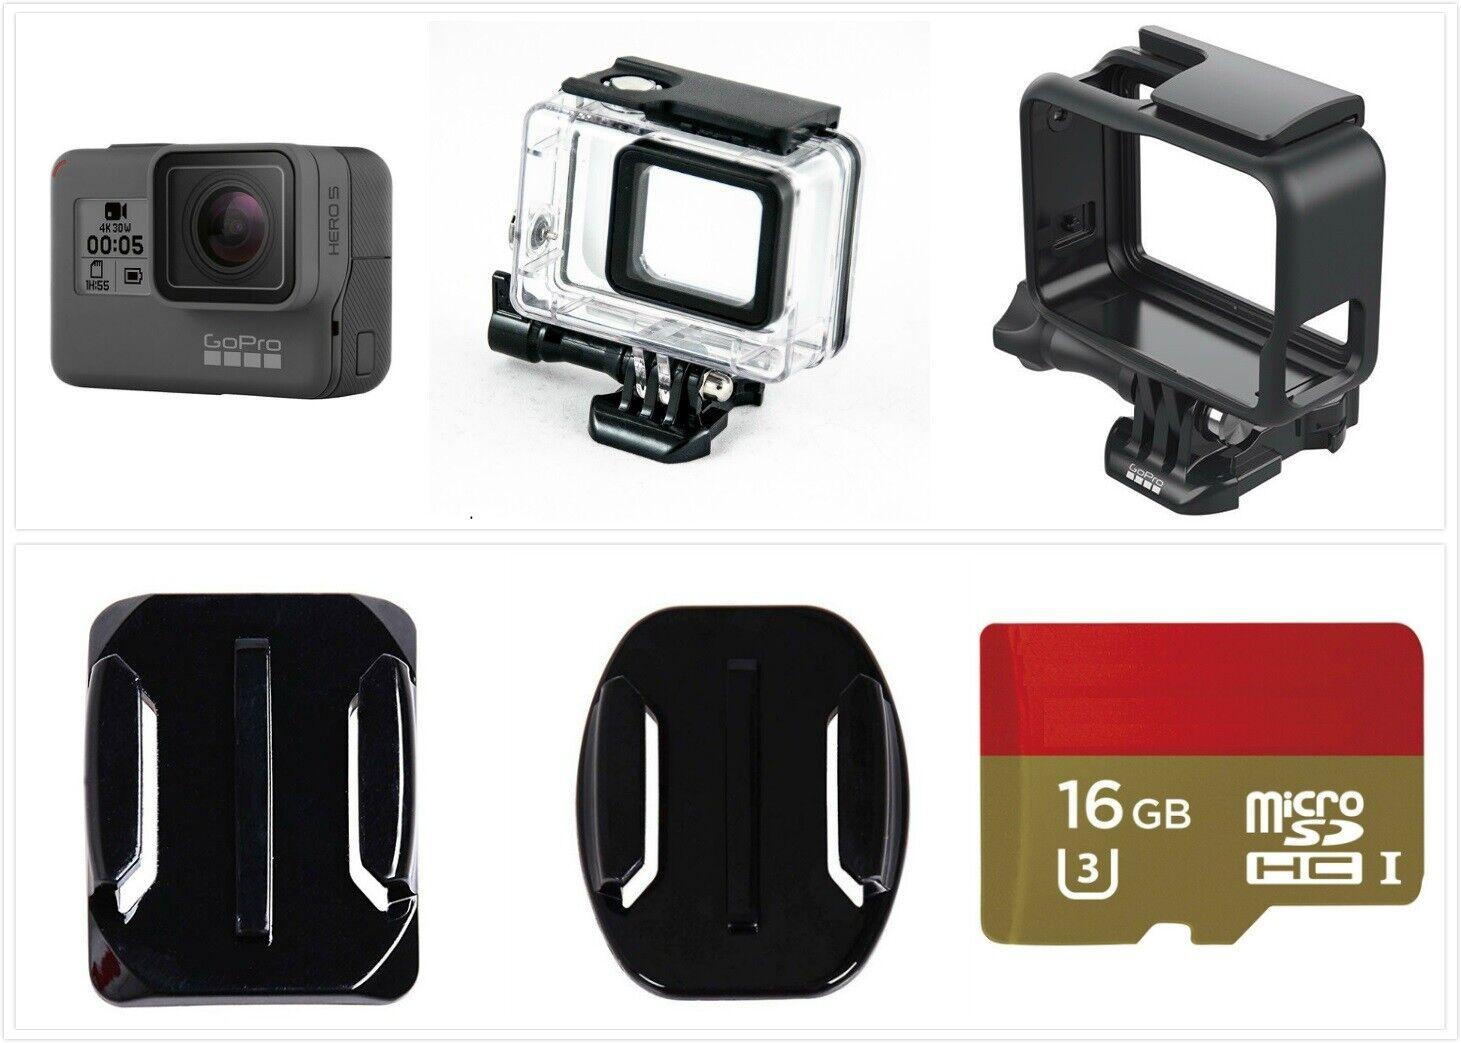 New GoPro HERO 5 Black Waterproof Action 4K Ultra HD Camera Frame 16GB card Kit 16gb action black camera frame gopro hero new ultra waterproof